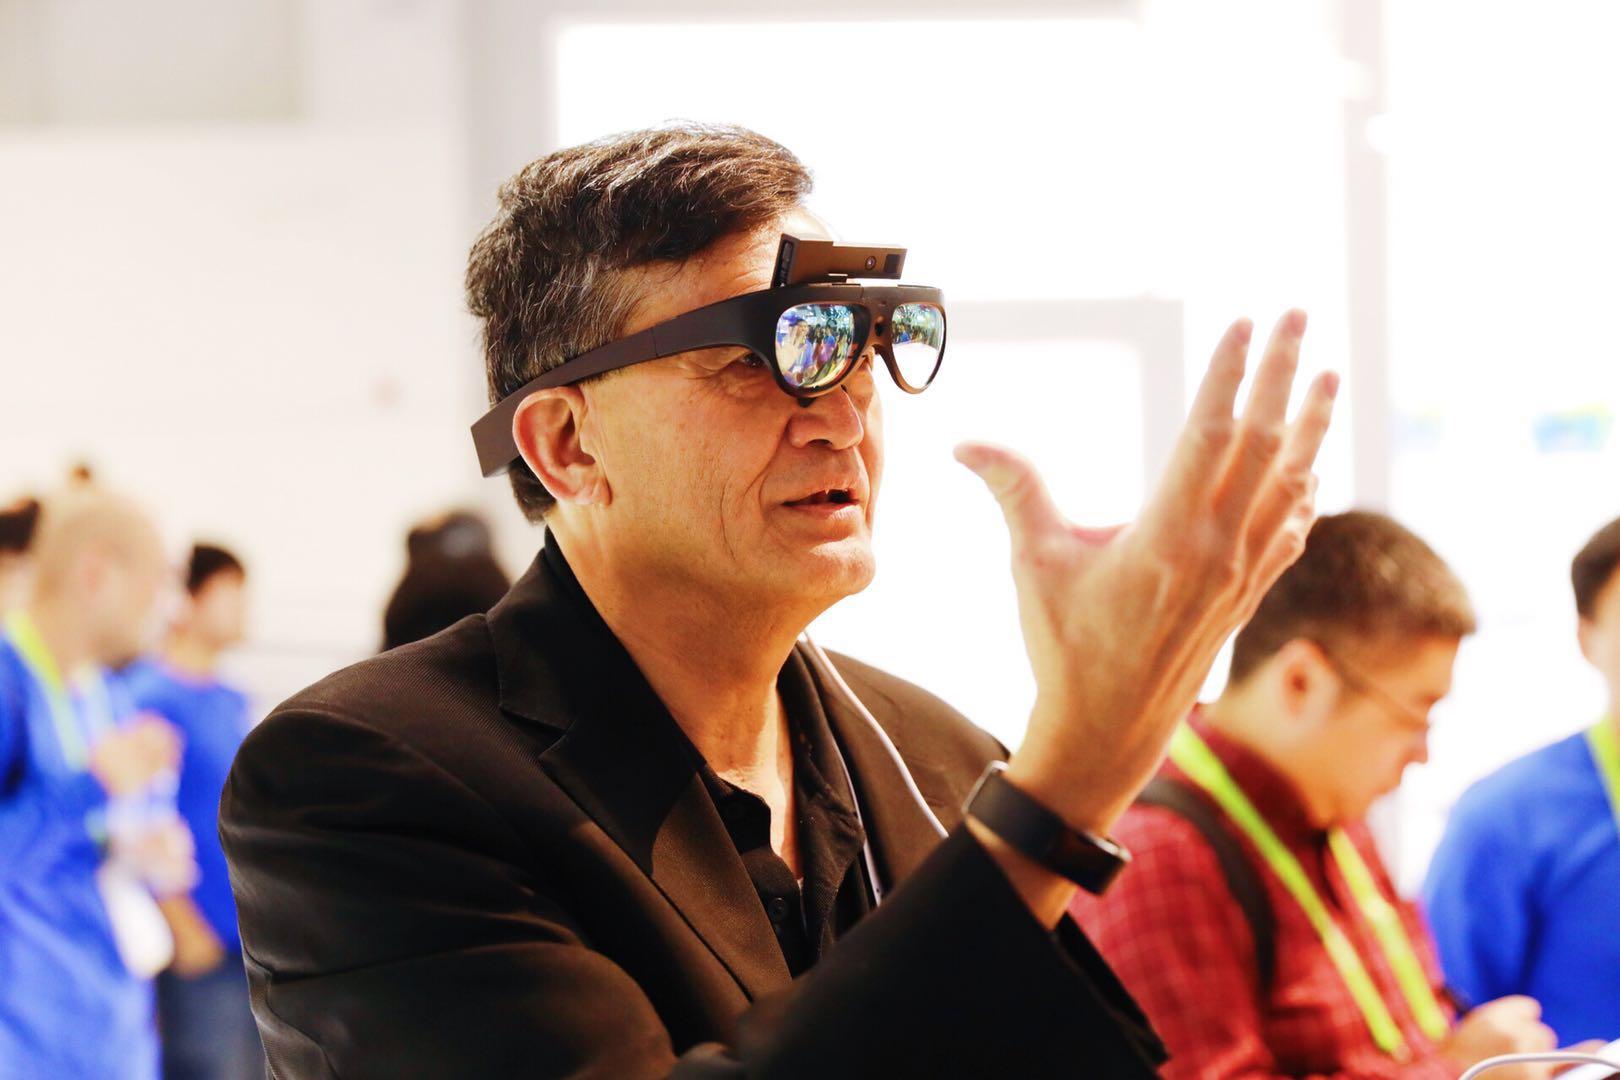 Rokid发布AR眼镜新品 支持人脸识别手势识别等功能